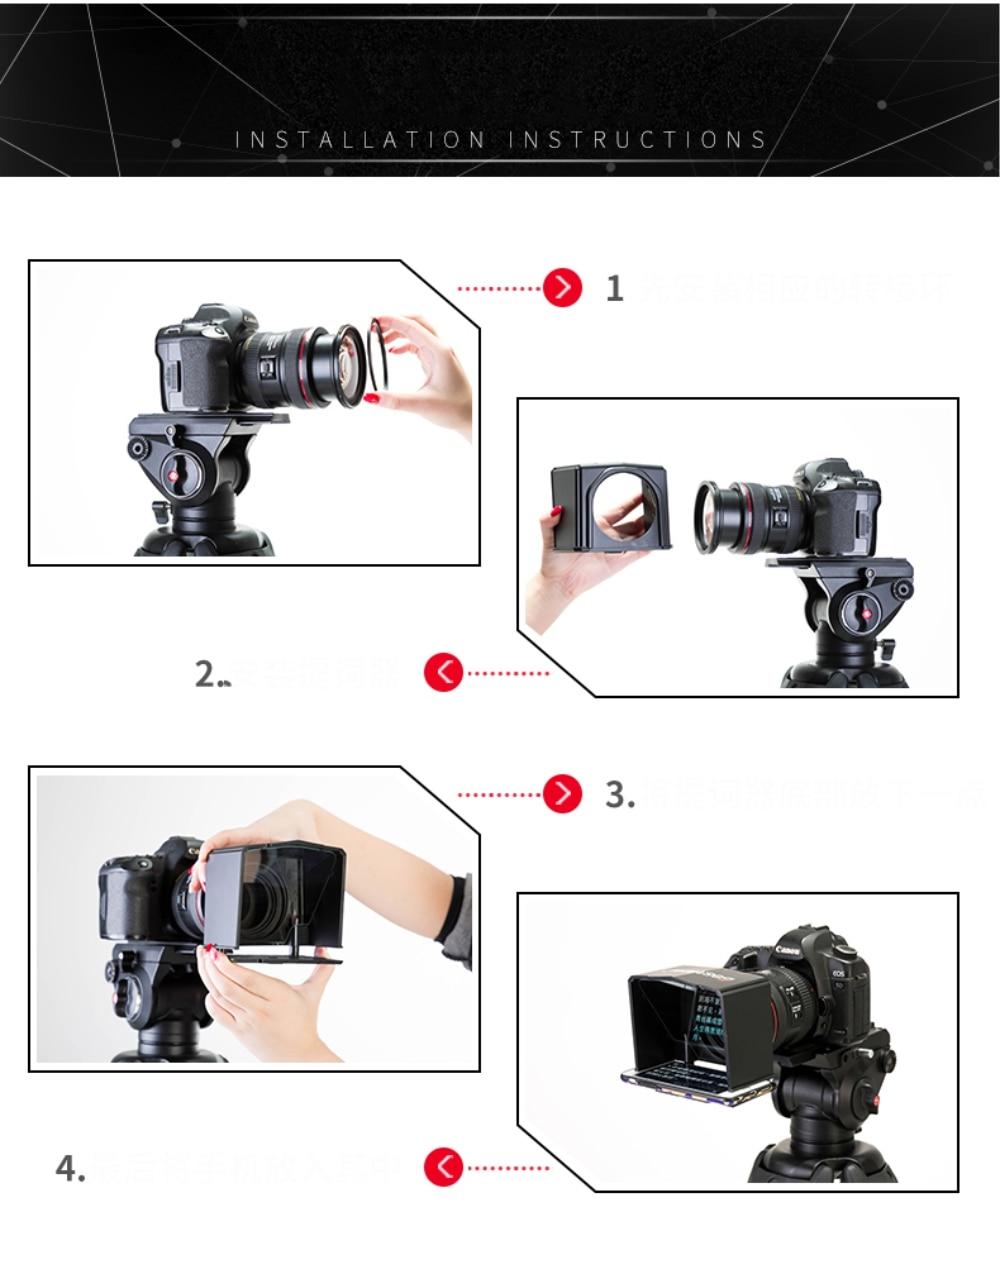 Bestview Smartphone Teleprompter for Canon Nikon Sony Camera Photo Studio DSLR for Youtube Interview Teleprompter Video Camera zhiyun